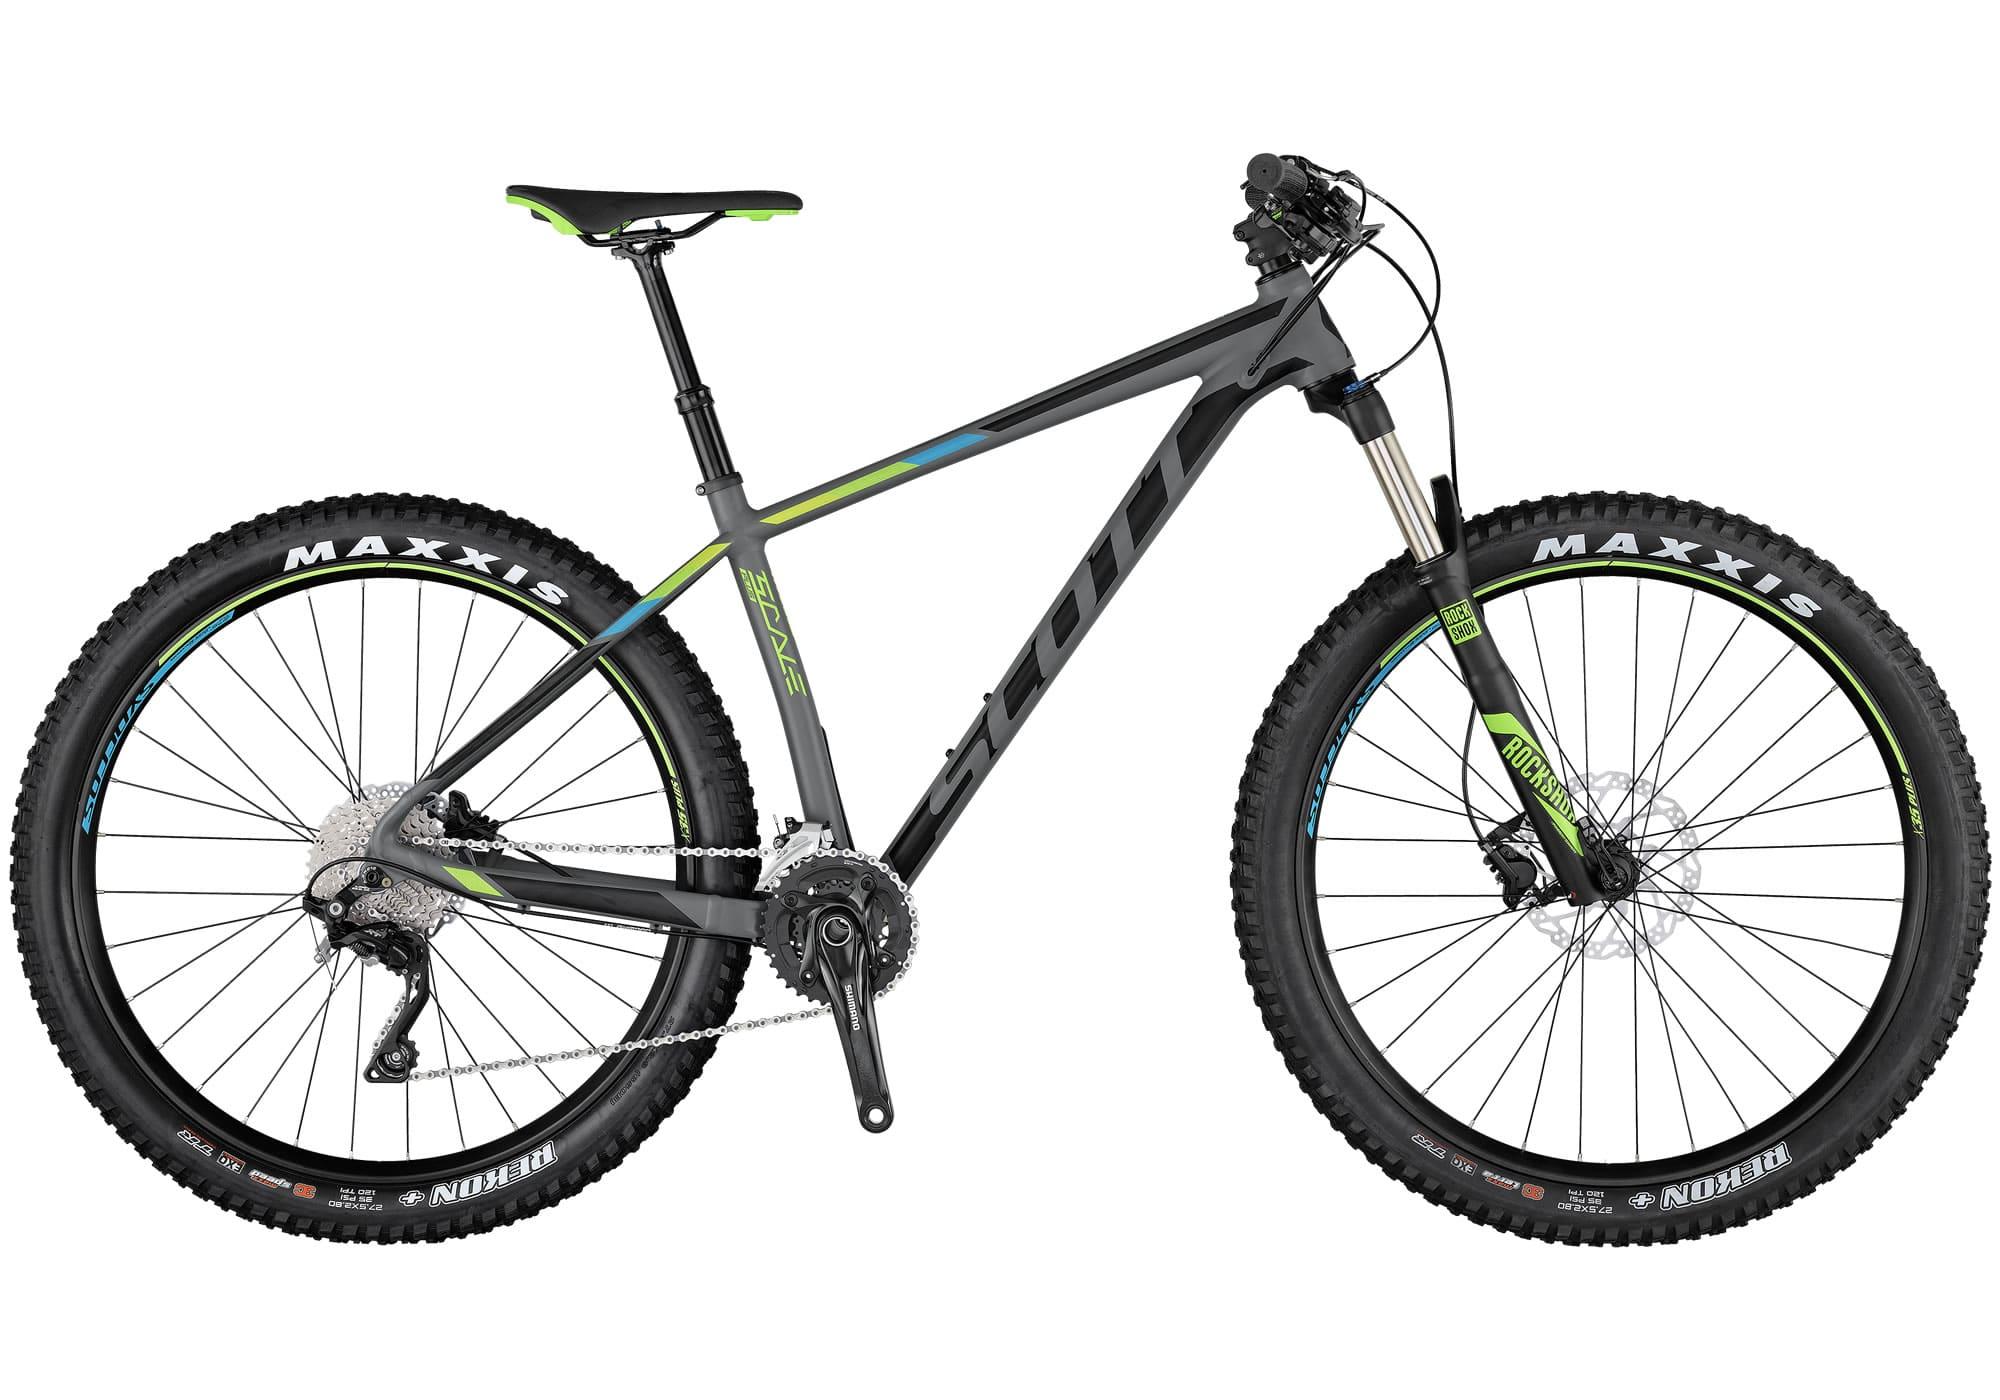 Bicicleta de montaña Scott Scale 720 Plus 2017. Nueva e ...